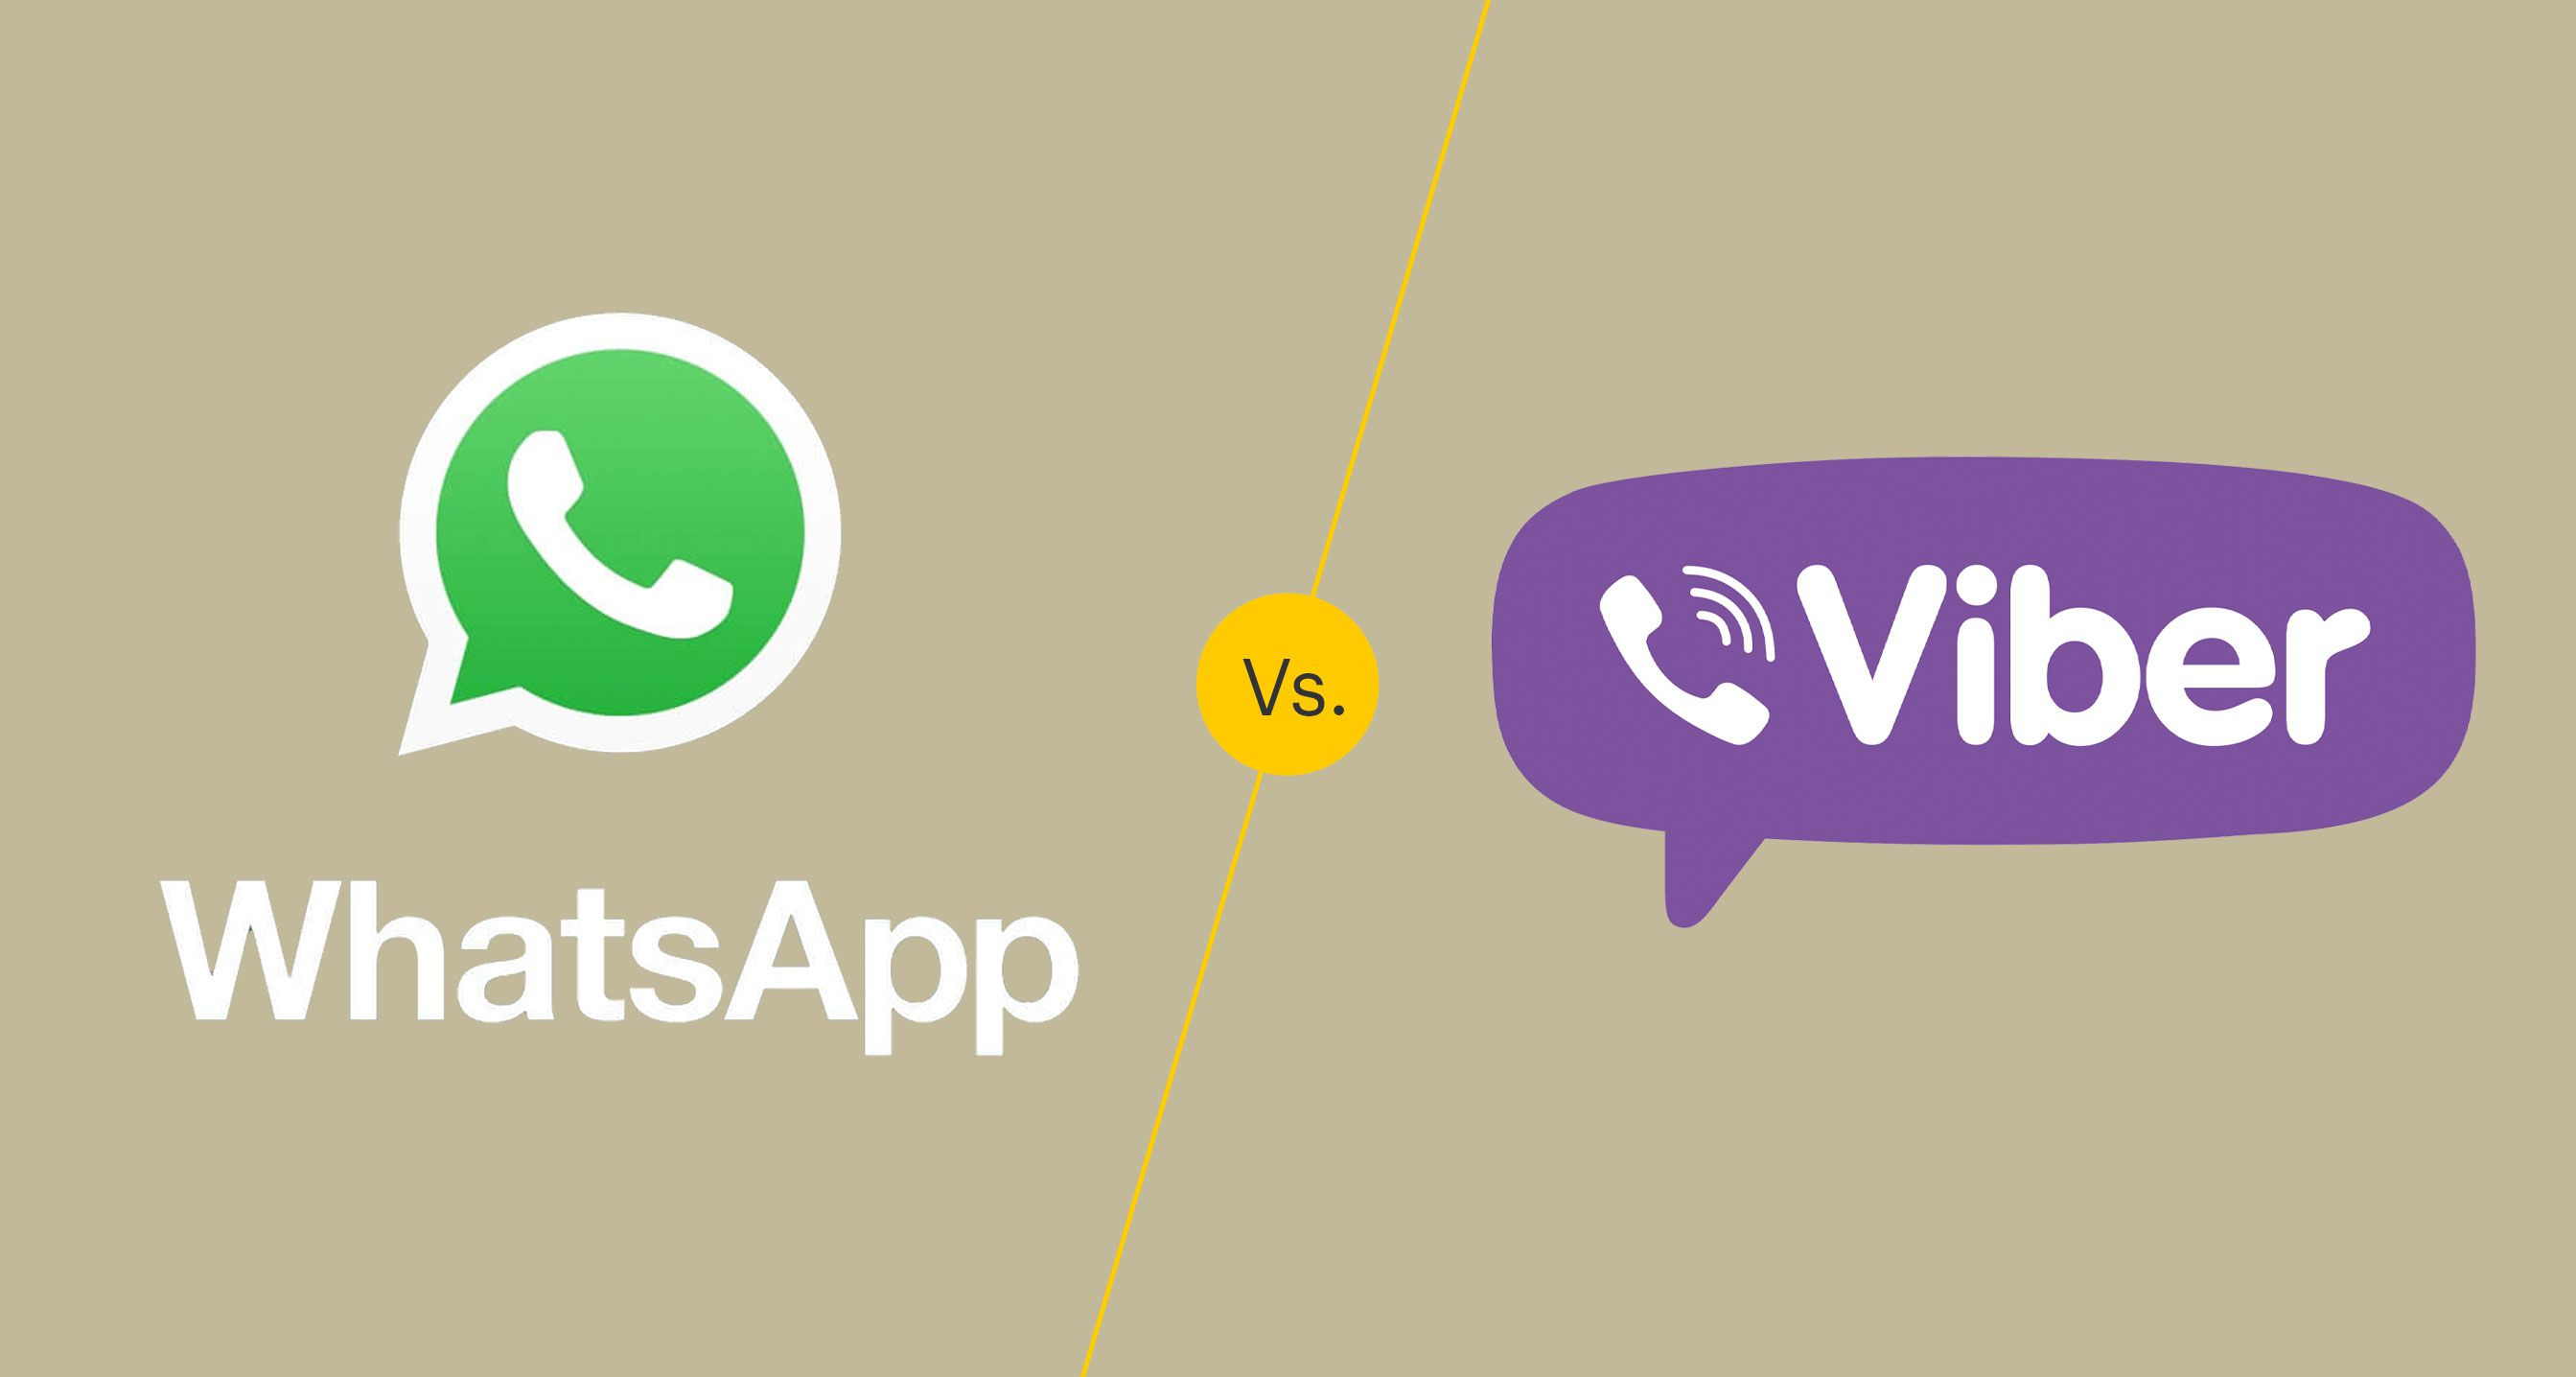 WhatsApp vs  Viber